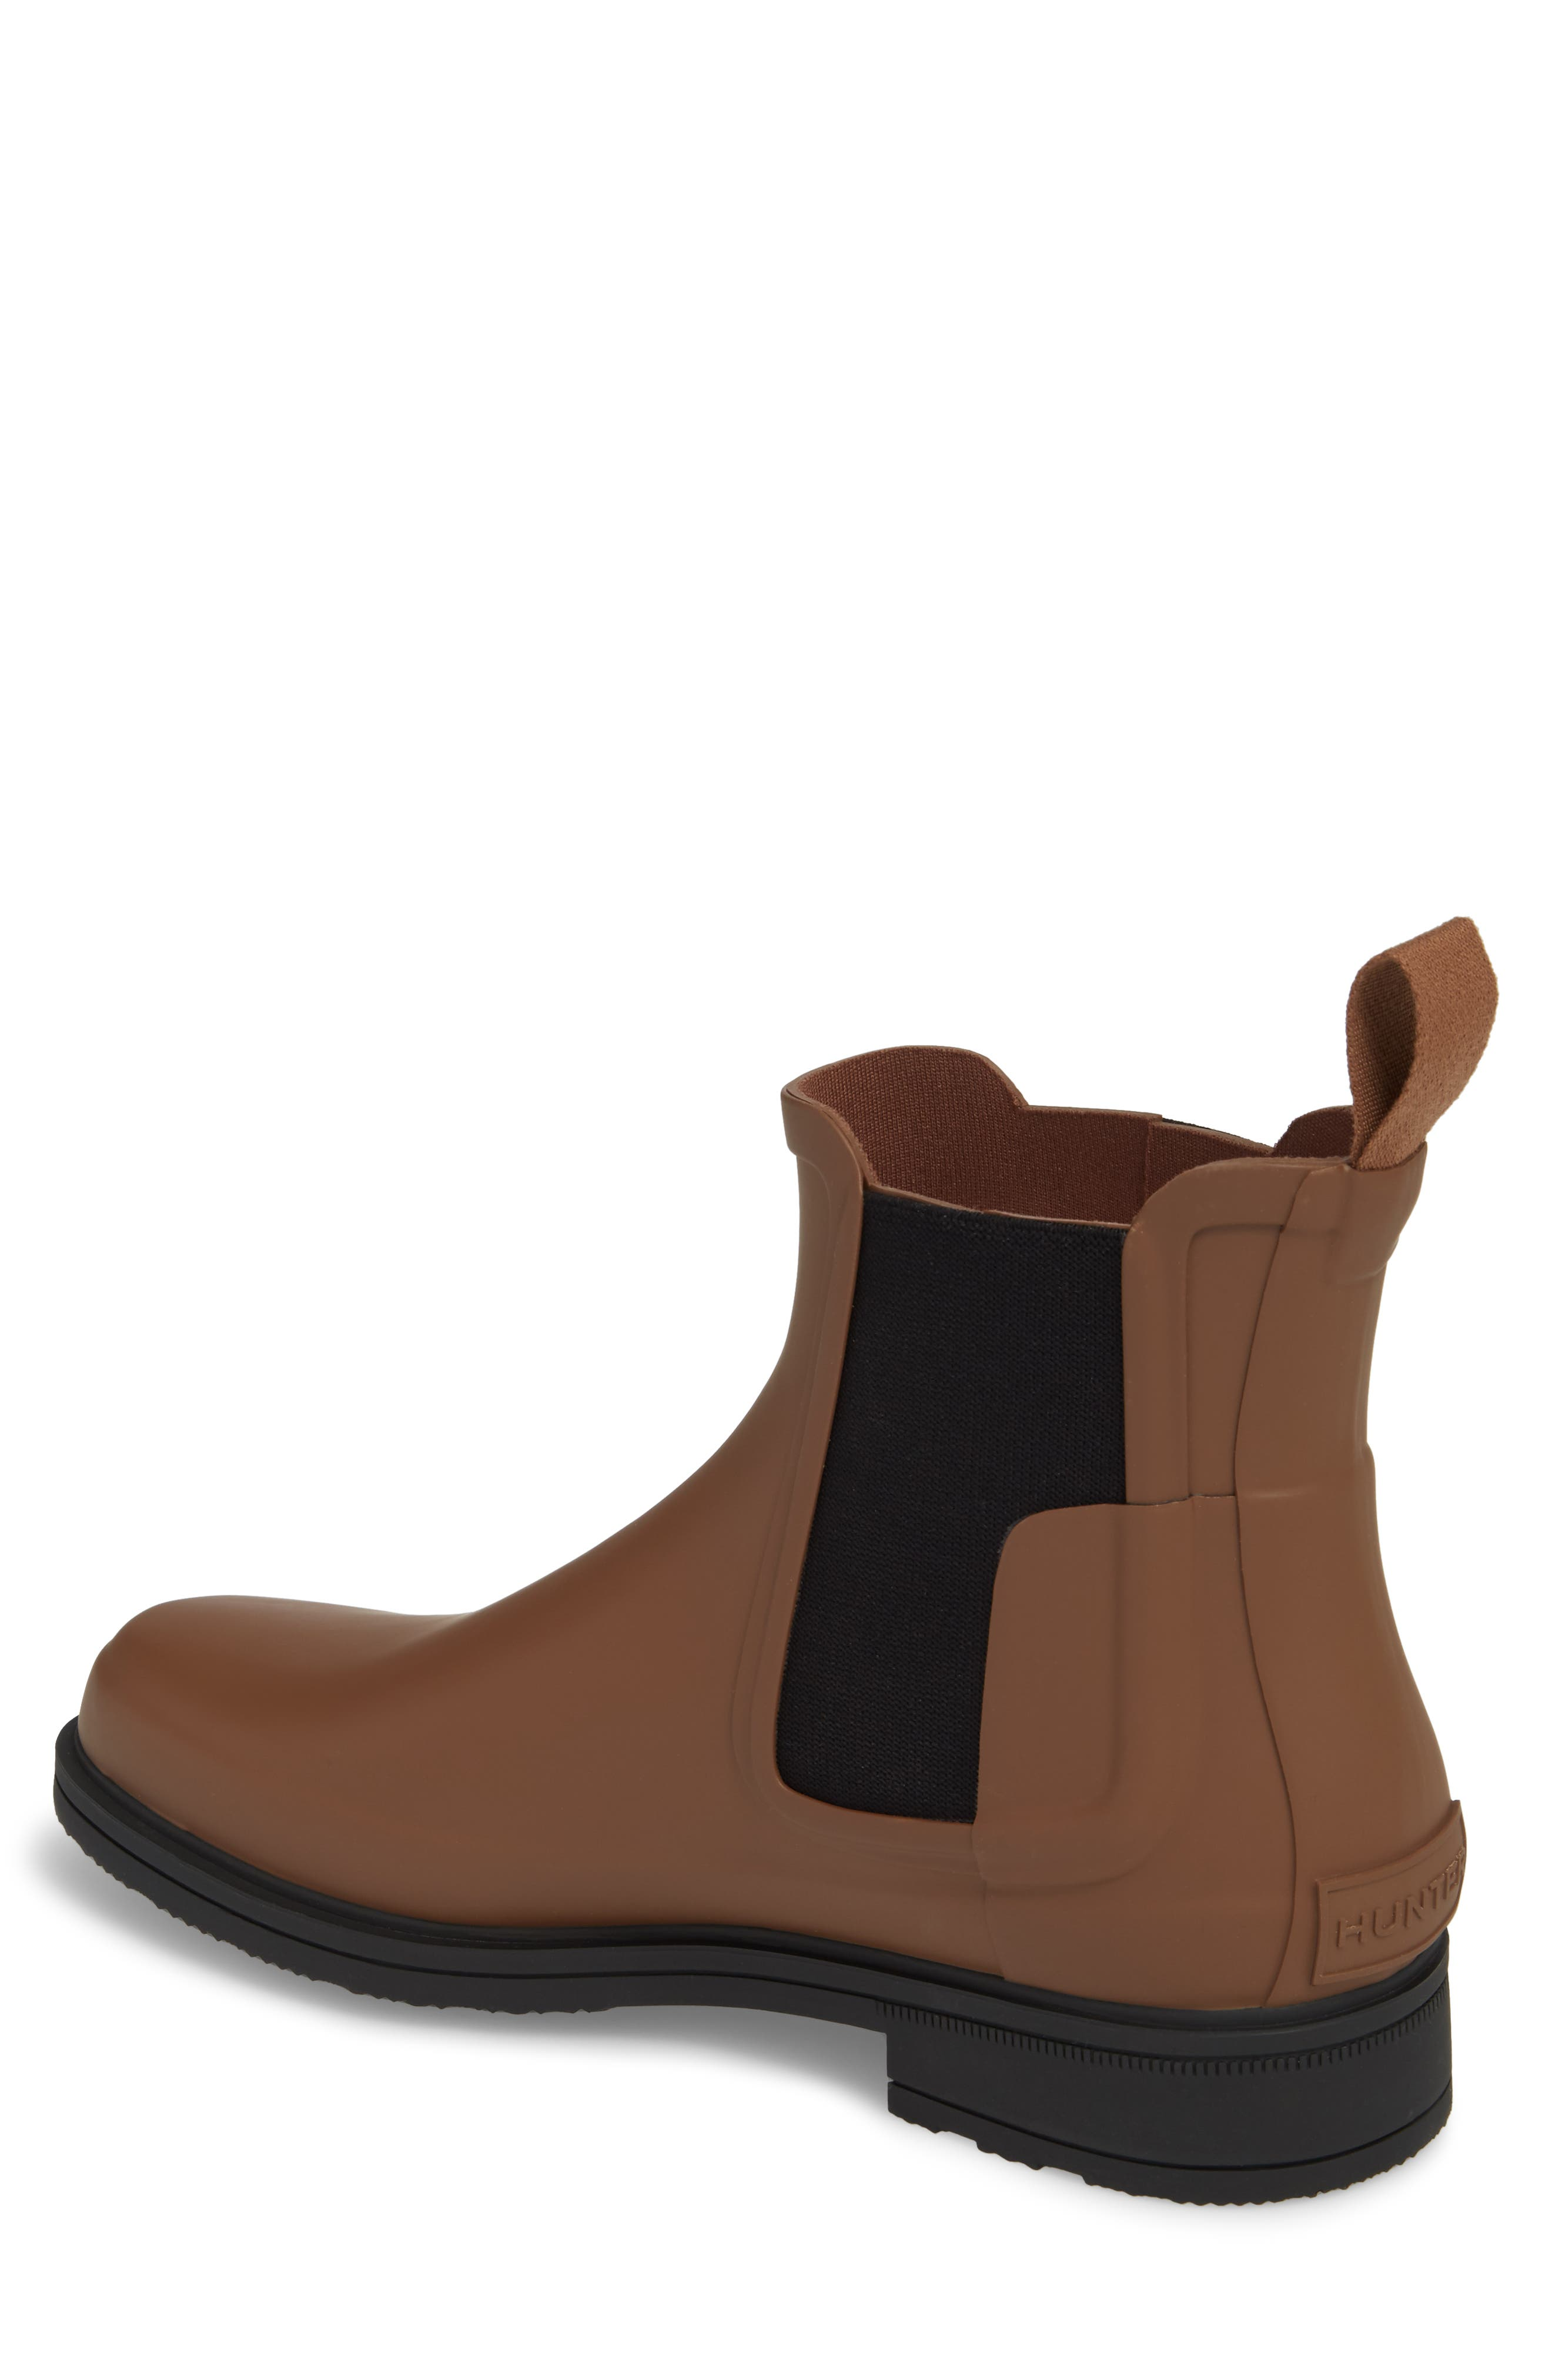 Original Refined Waterproof Chelsea Boot,                             Alternate thumbnail 2, color,                             SOIL/ BLACK